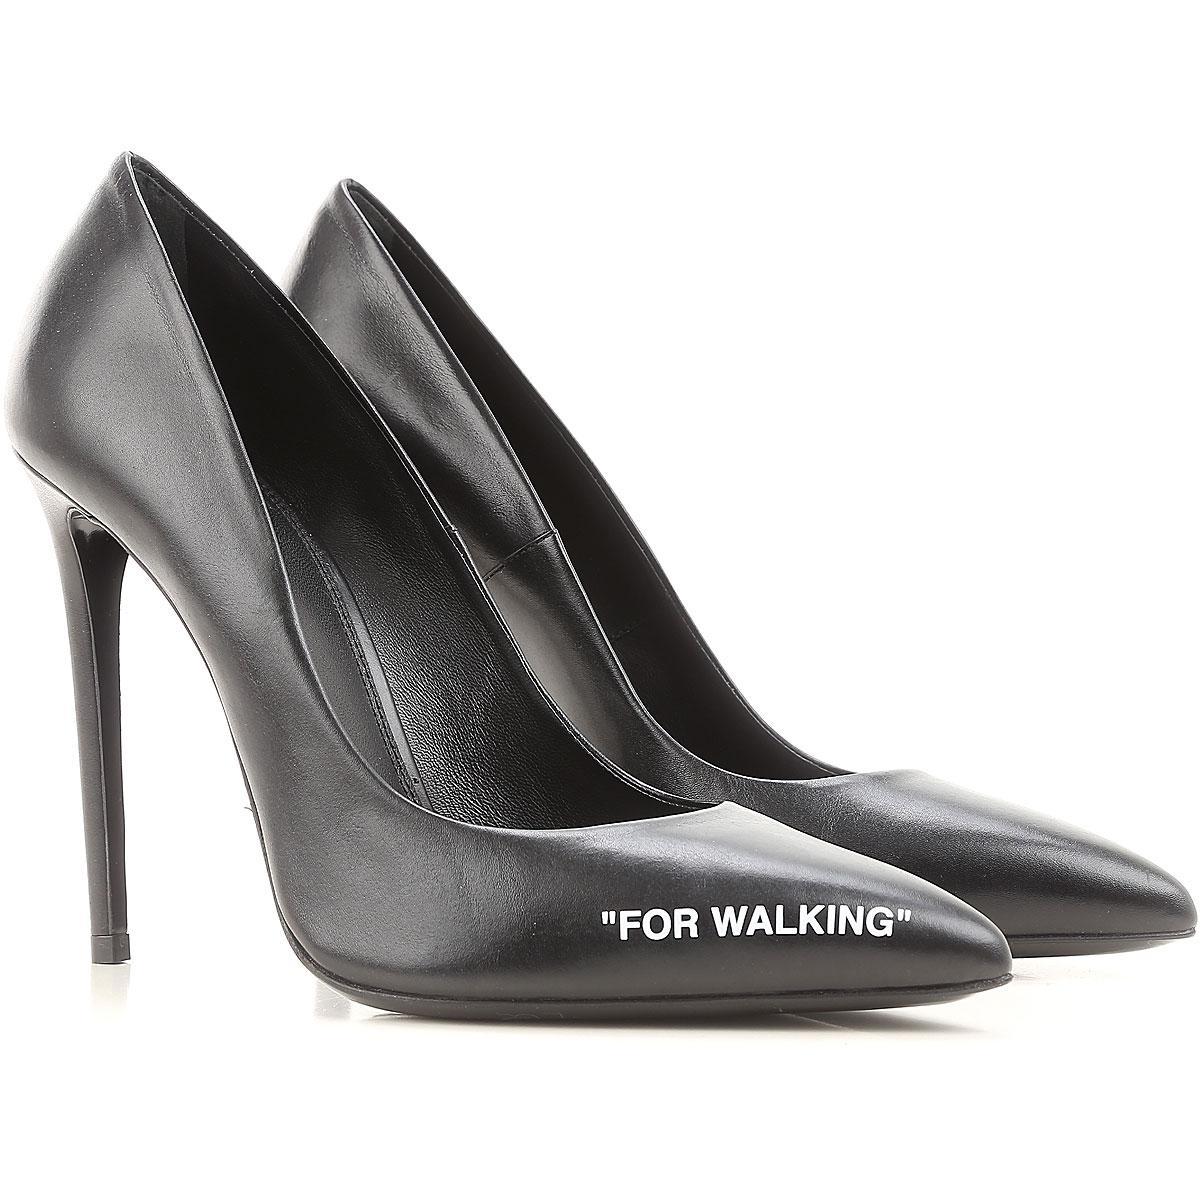 5f2ab53b2 Off-White c/o Virgil Abloh Black Pumps & High Heels For Women On. View  fullscreen